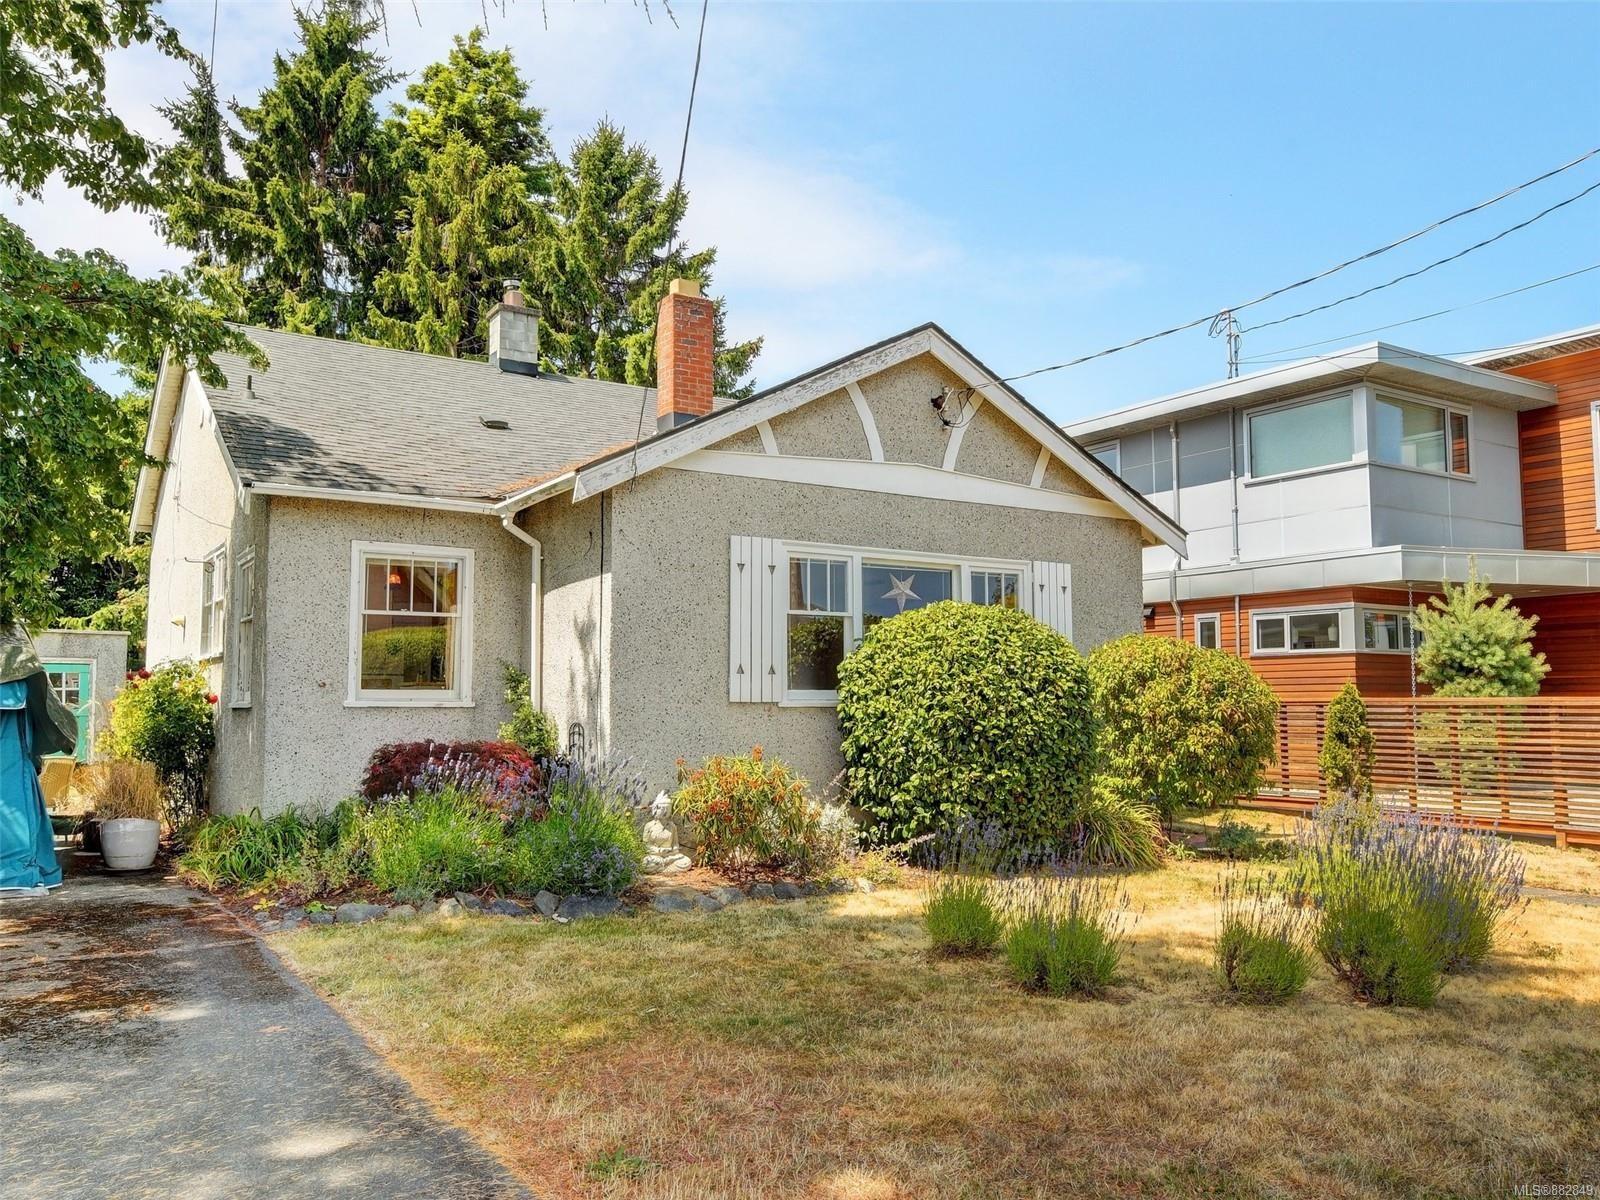 Main Photo: 942 Monterey Ave in : OB South Oak Bay House for sale (Oak Bay)  : MLS®# 882849